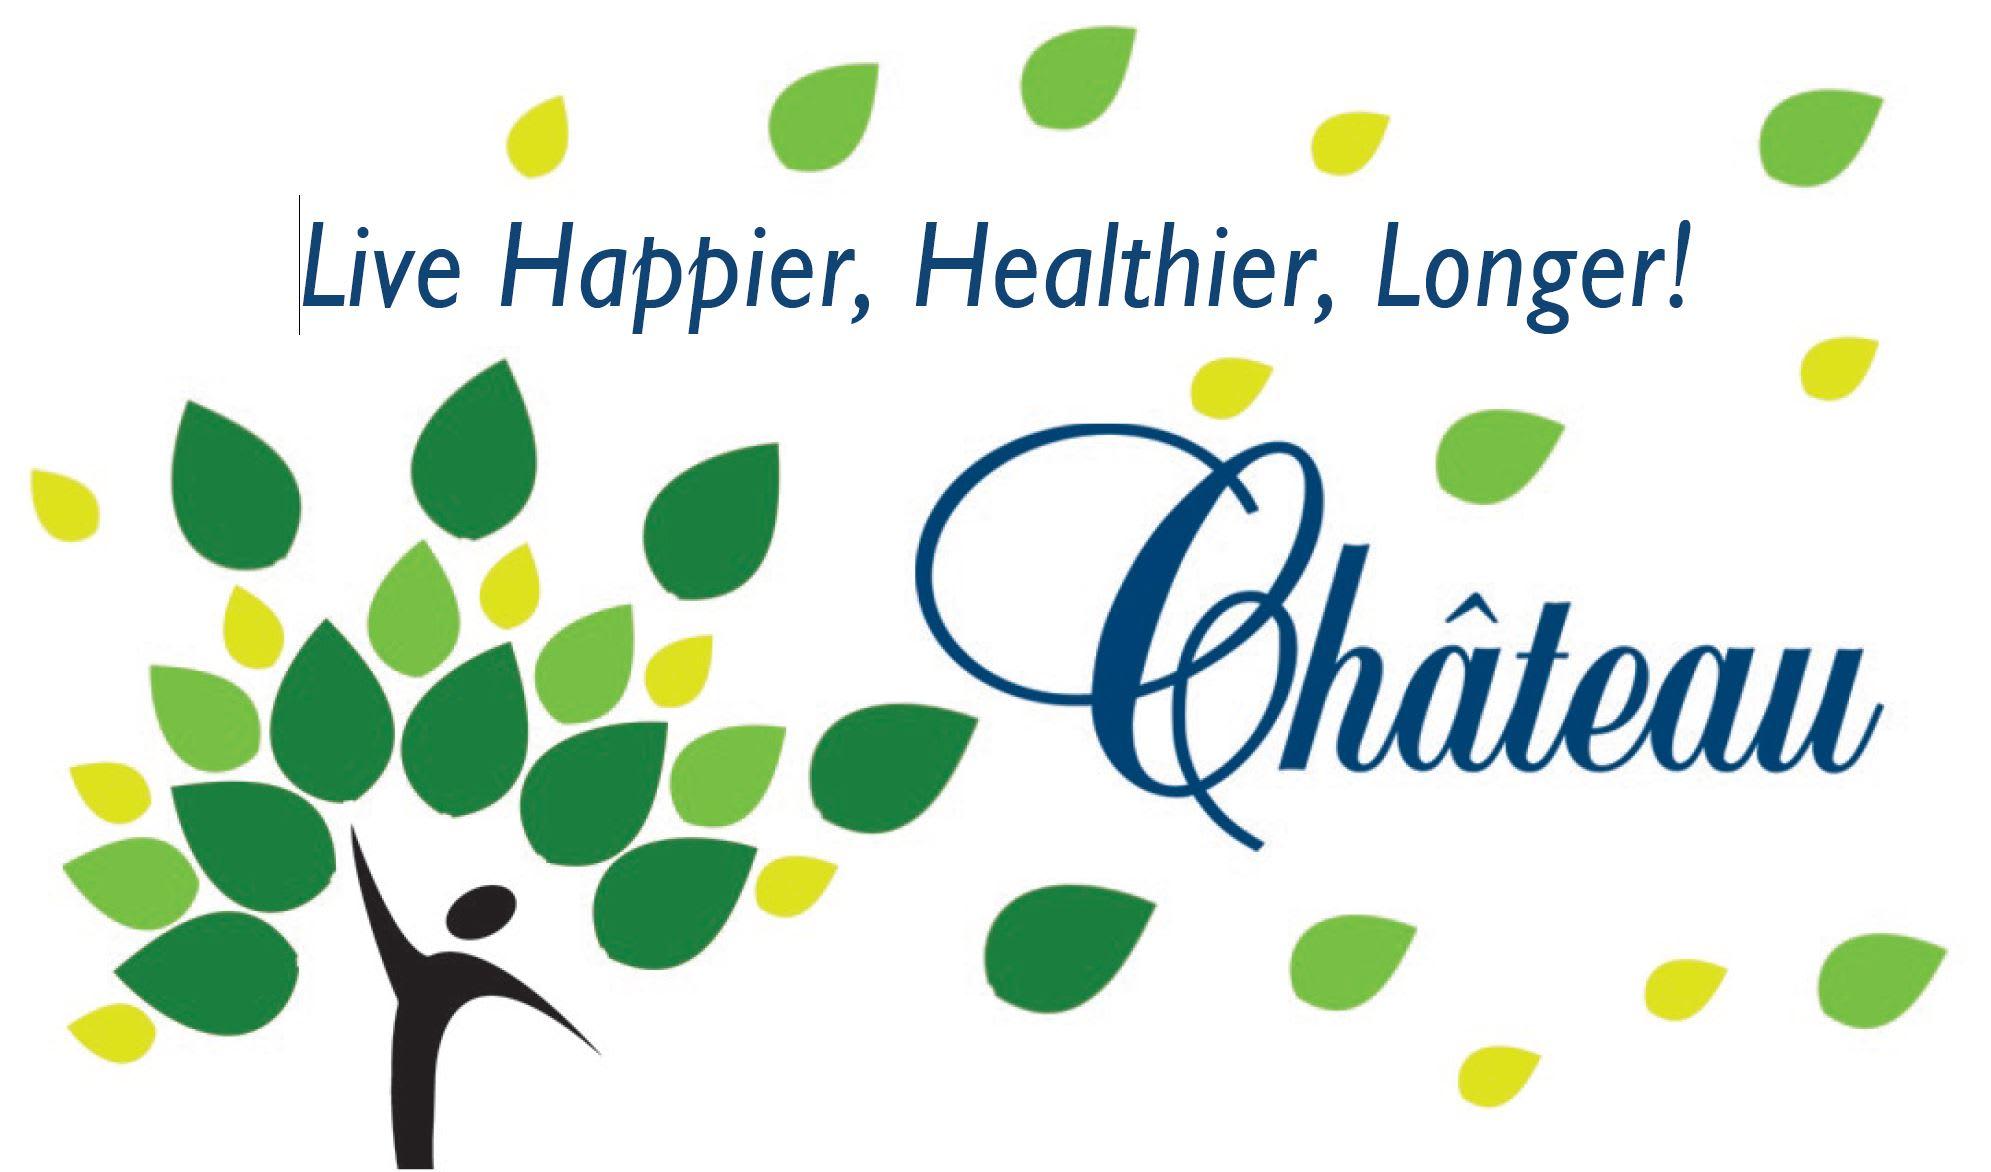 1991x1172 Chateau Retirement Communities Llc Leadership Profiles